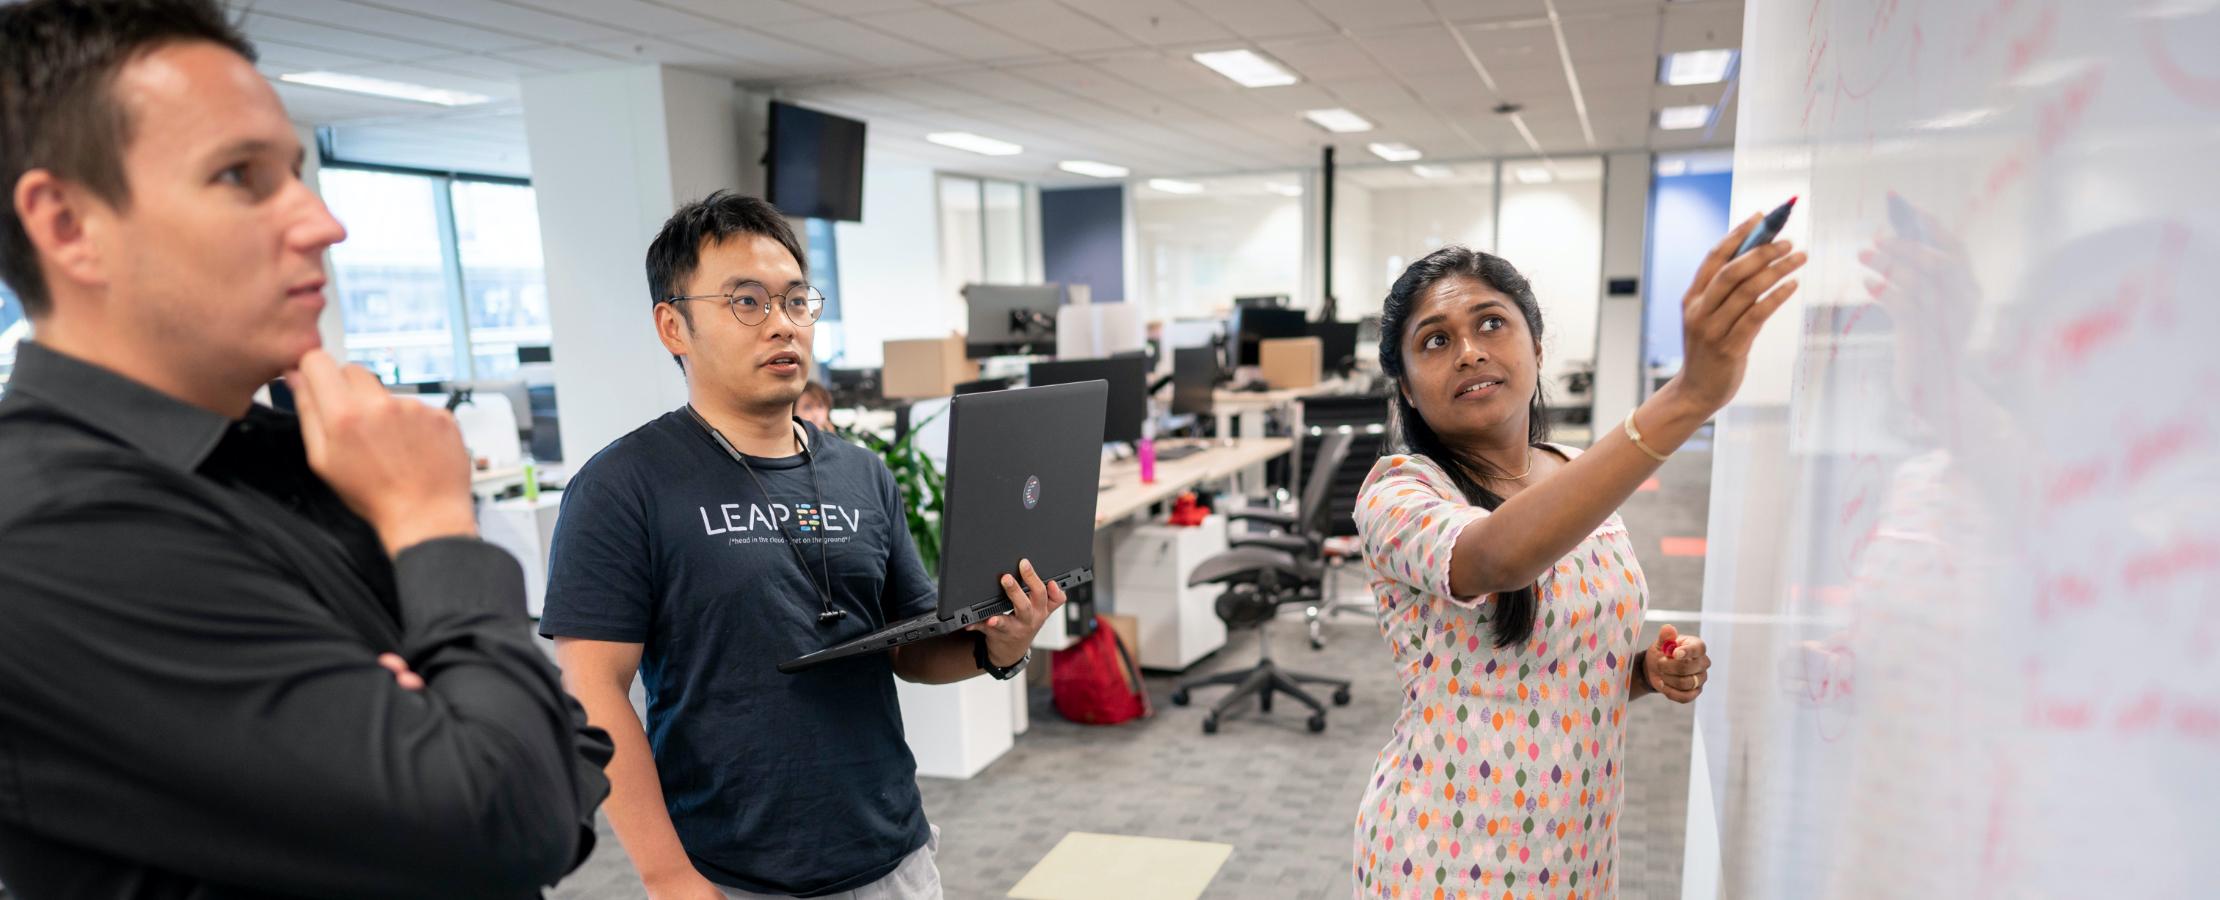 Office shot - LEAPsters in a meeting using blackboard